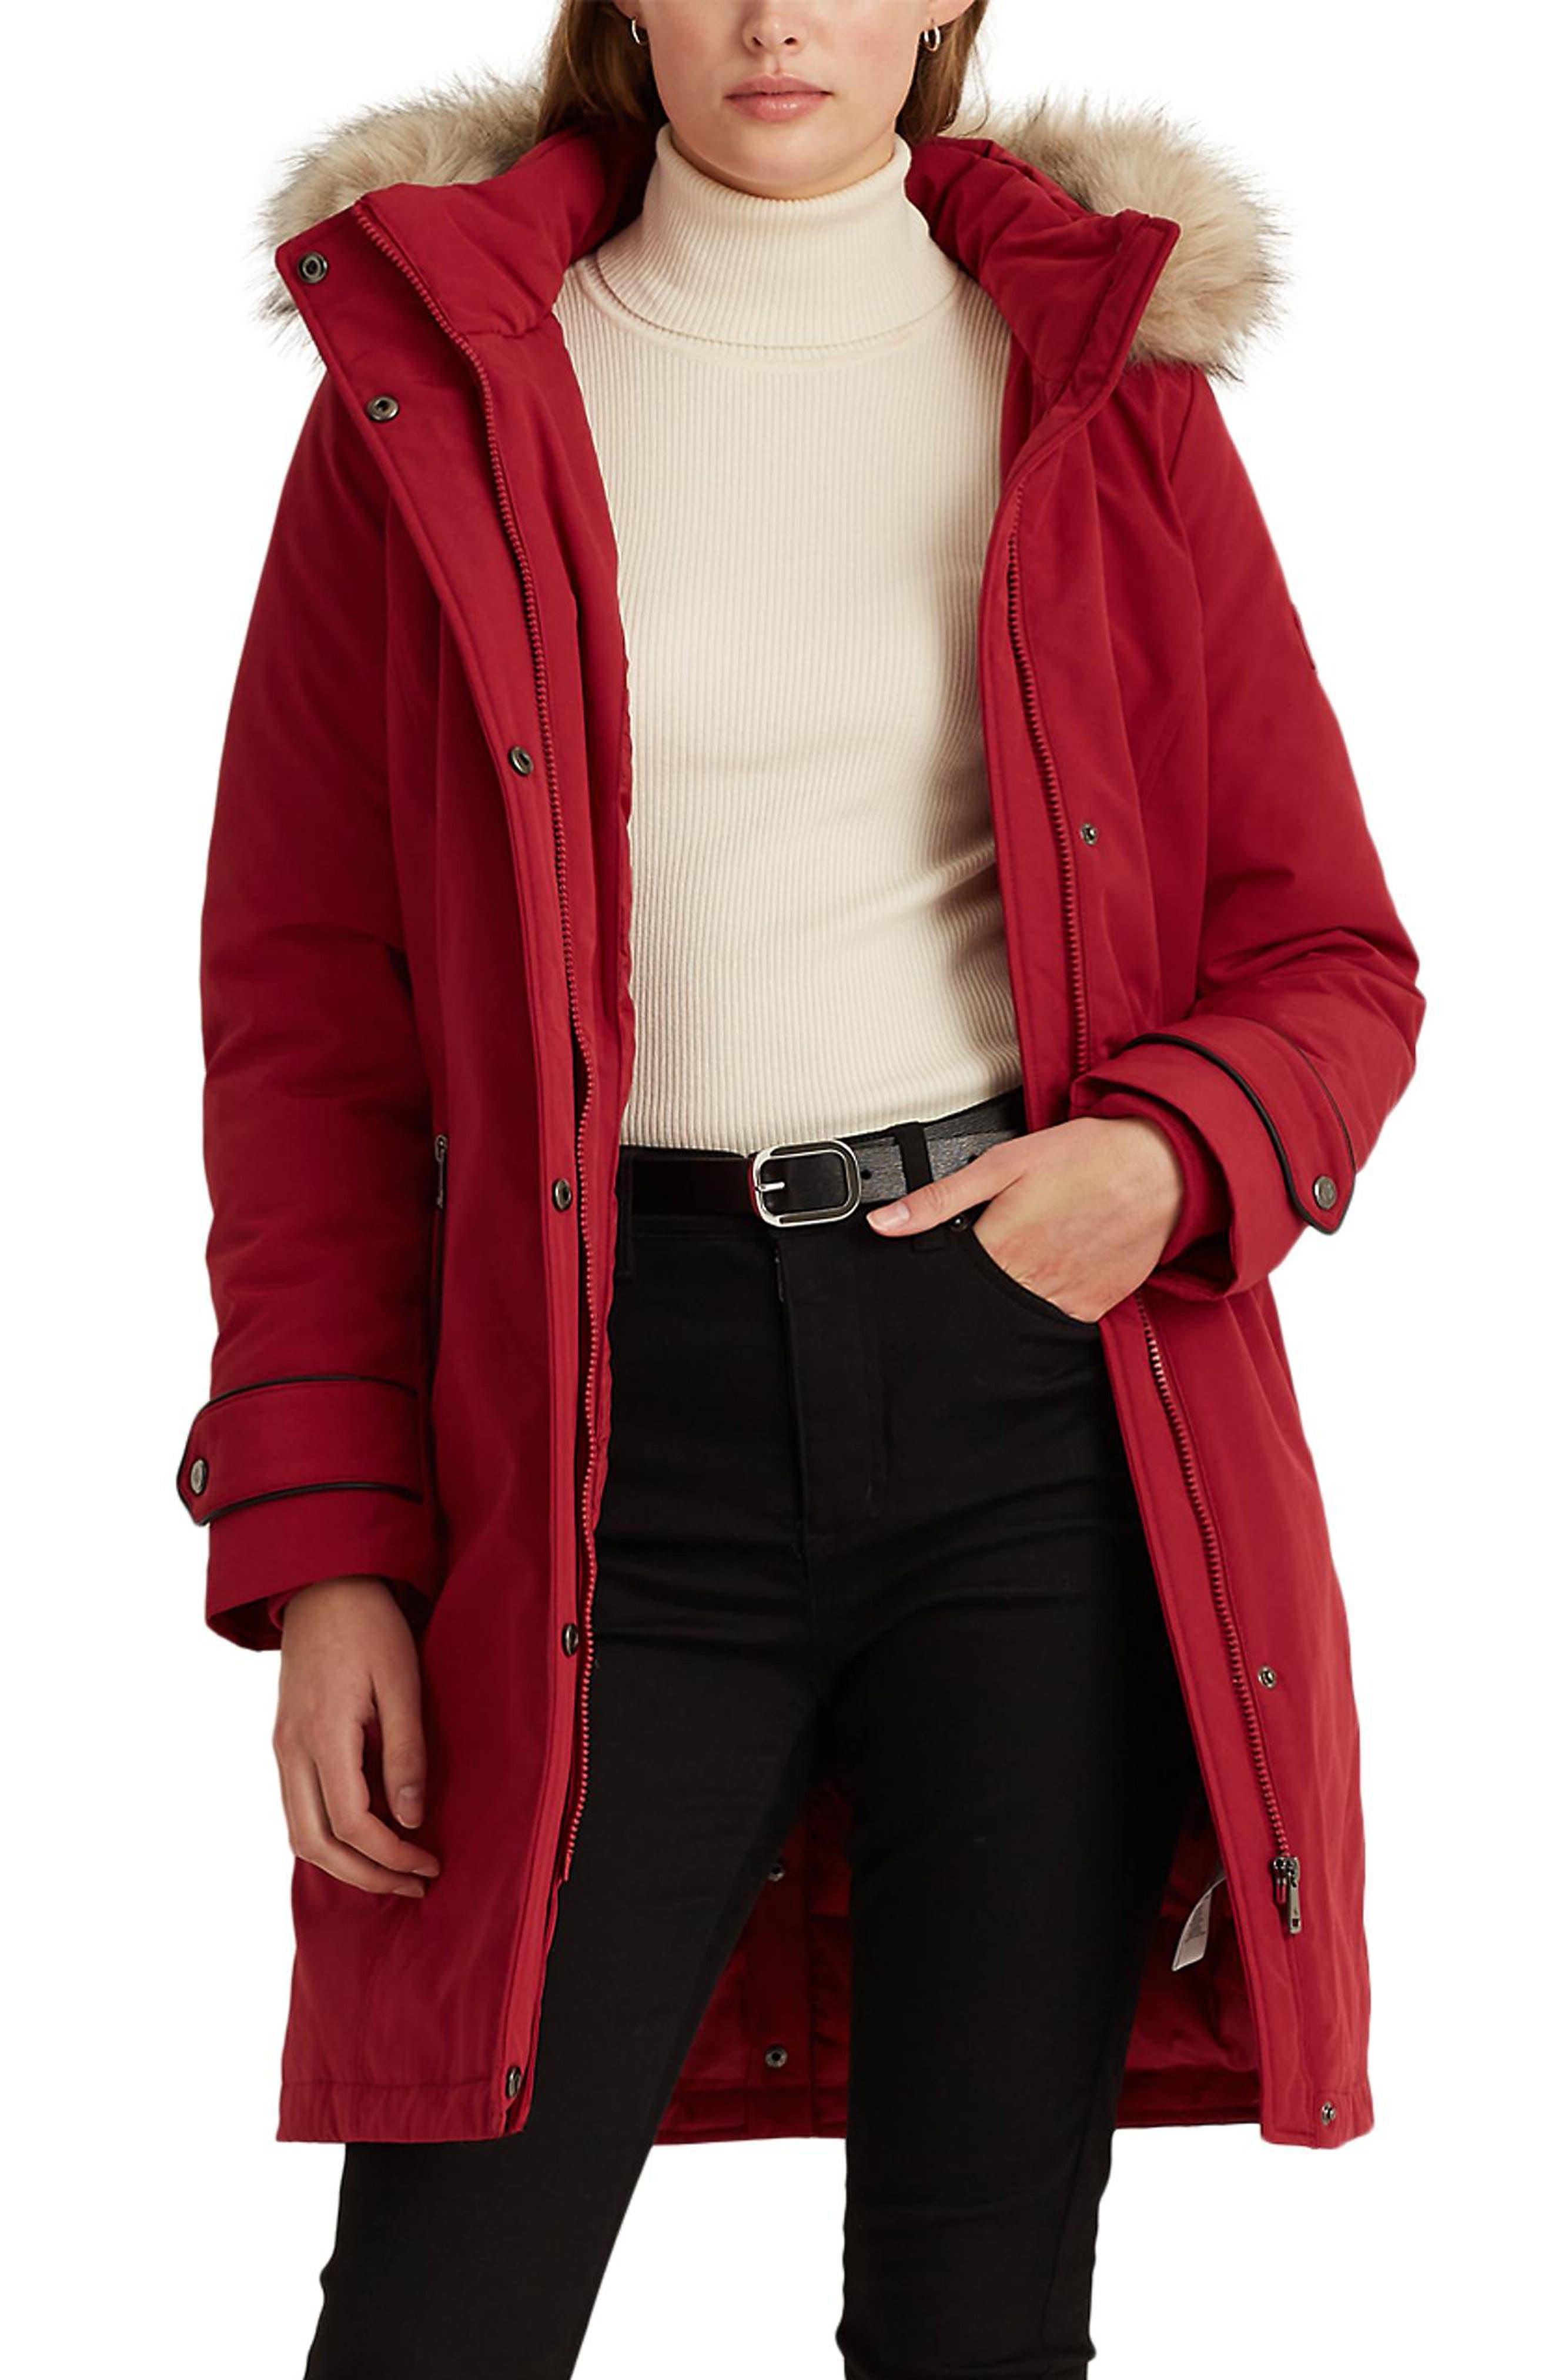 Pink eco coat Premium eco-fur Best seller Eco-fur Hand Made Jackets Soft Fur Winter short Coat Best Birthday Present Gift Winter Coatsize